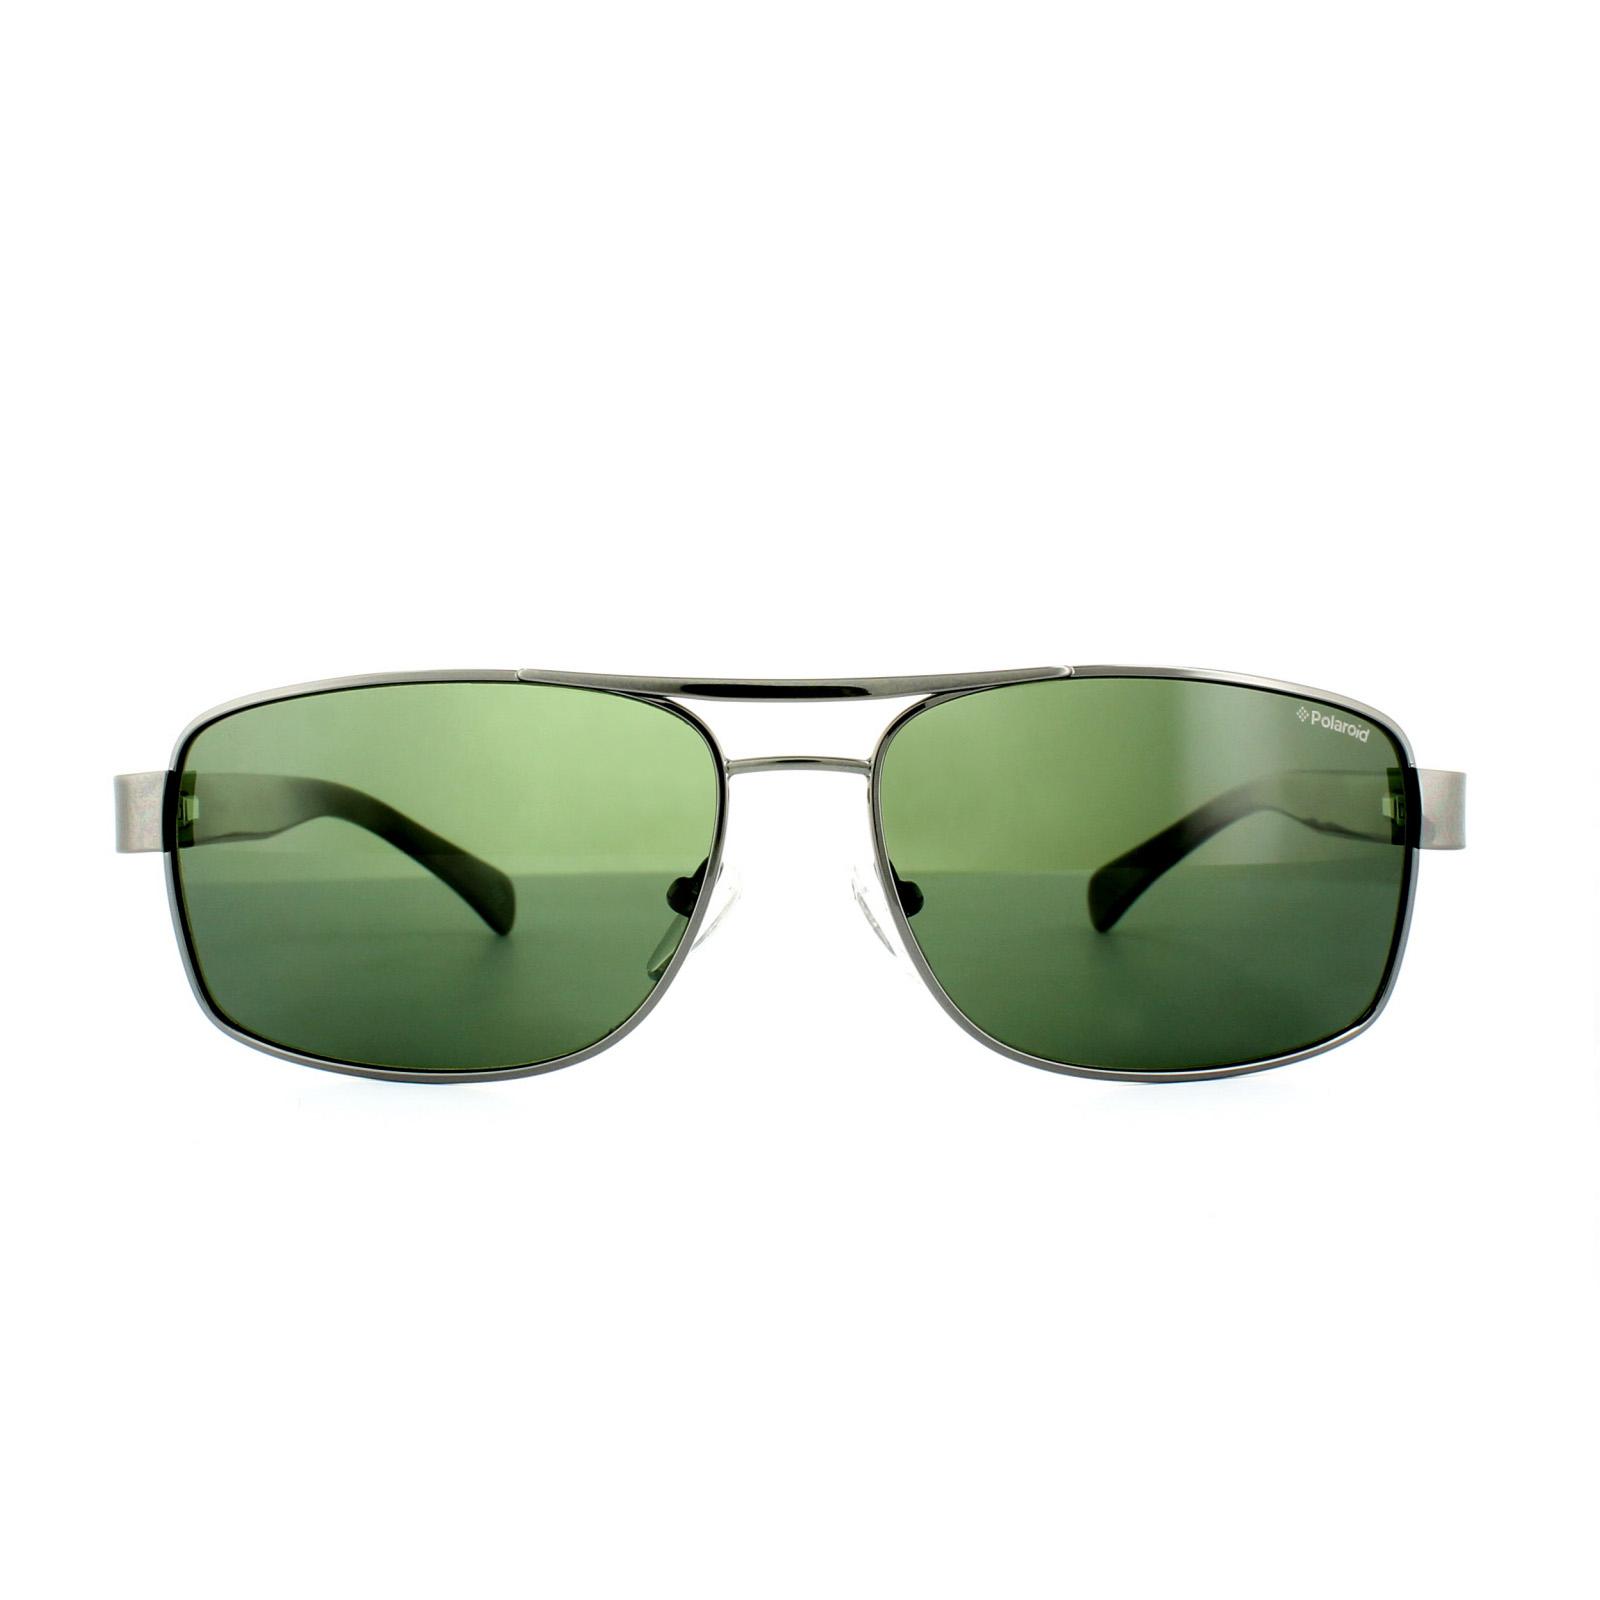 Cheap Polaroid Premium X4316 Sunglasses Discounted